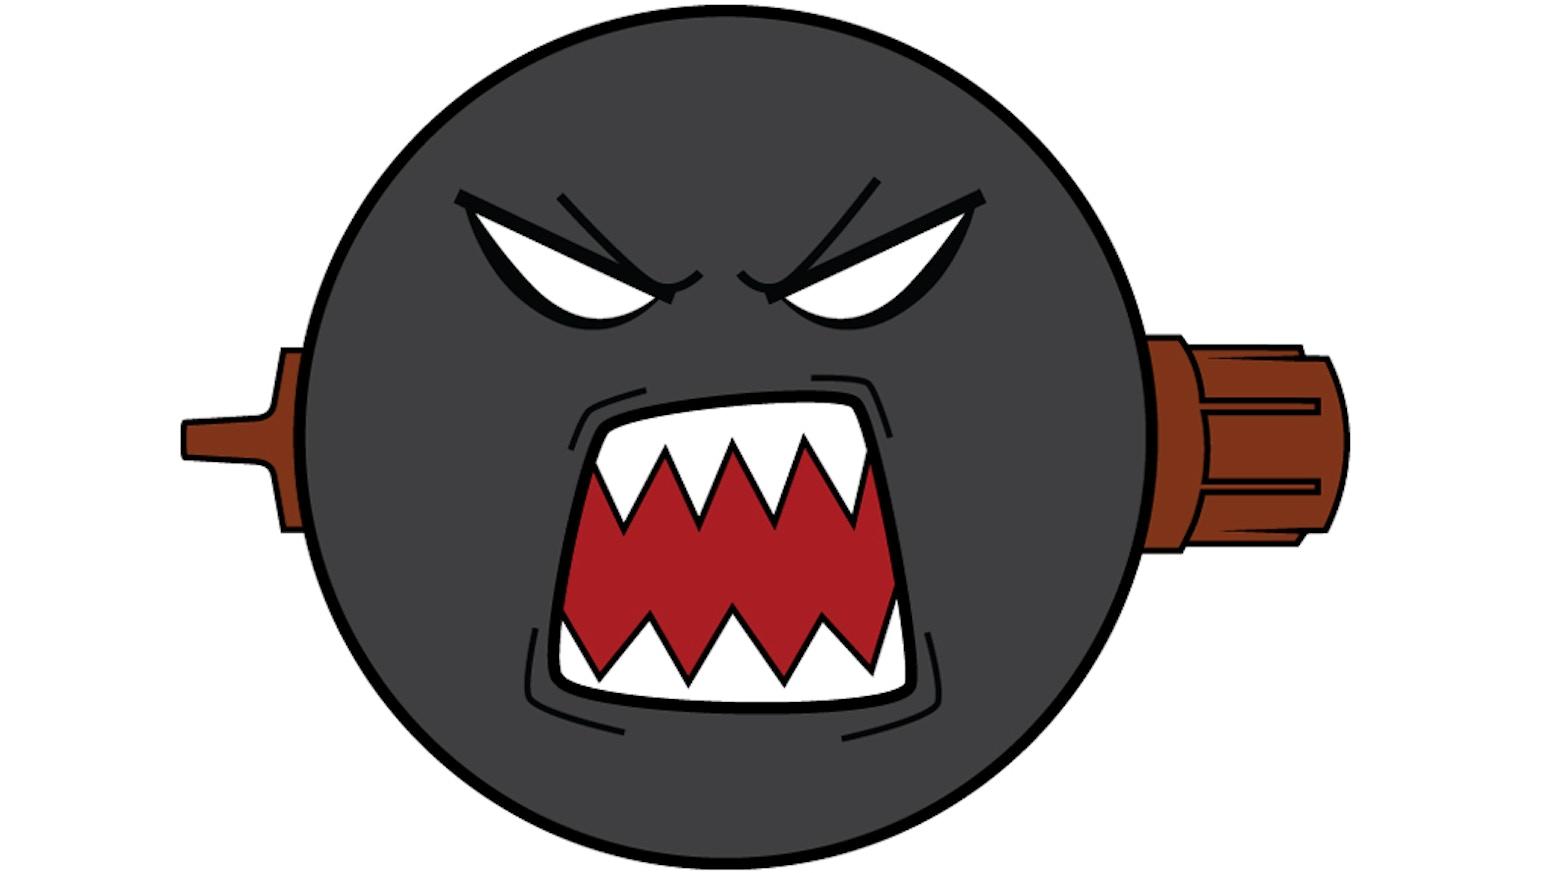 Angry PMN EOD Challenge Coin by Charlotte Lesperance — Kickstarter